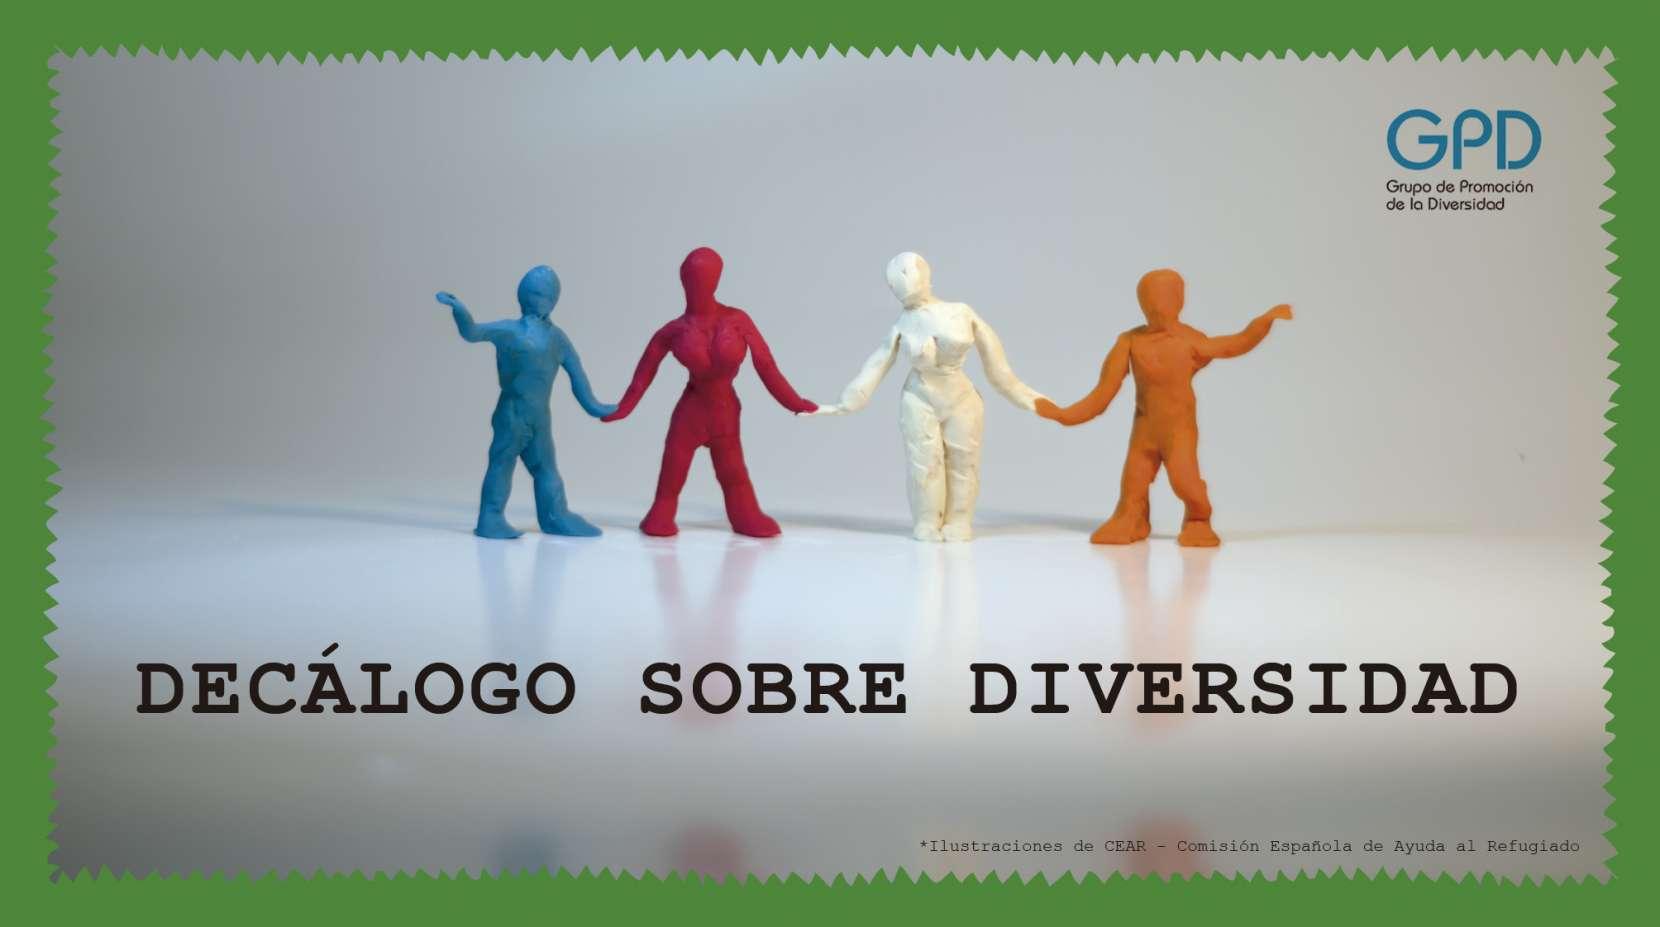 decalogo_con_logo_leyenda-01-1660x927.jpg